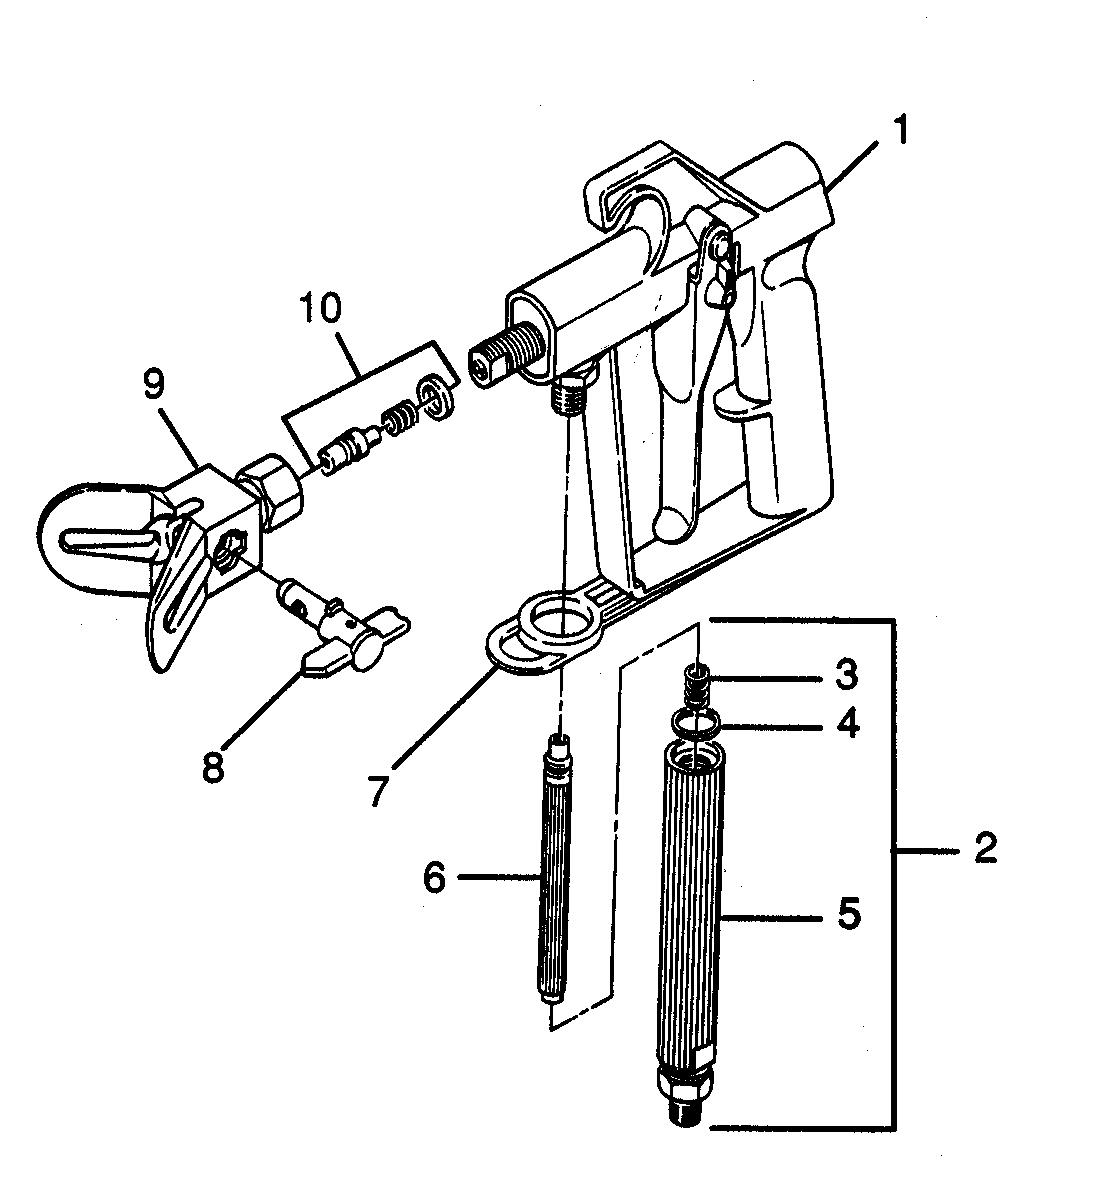 G-06 SPRAY GUN Diagram & Parts List for Model 834 Wagner